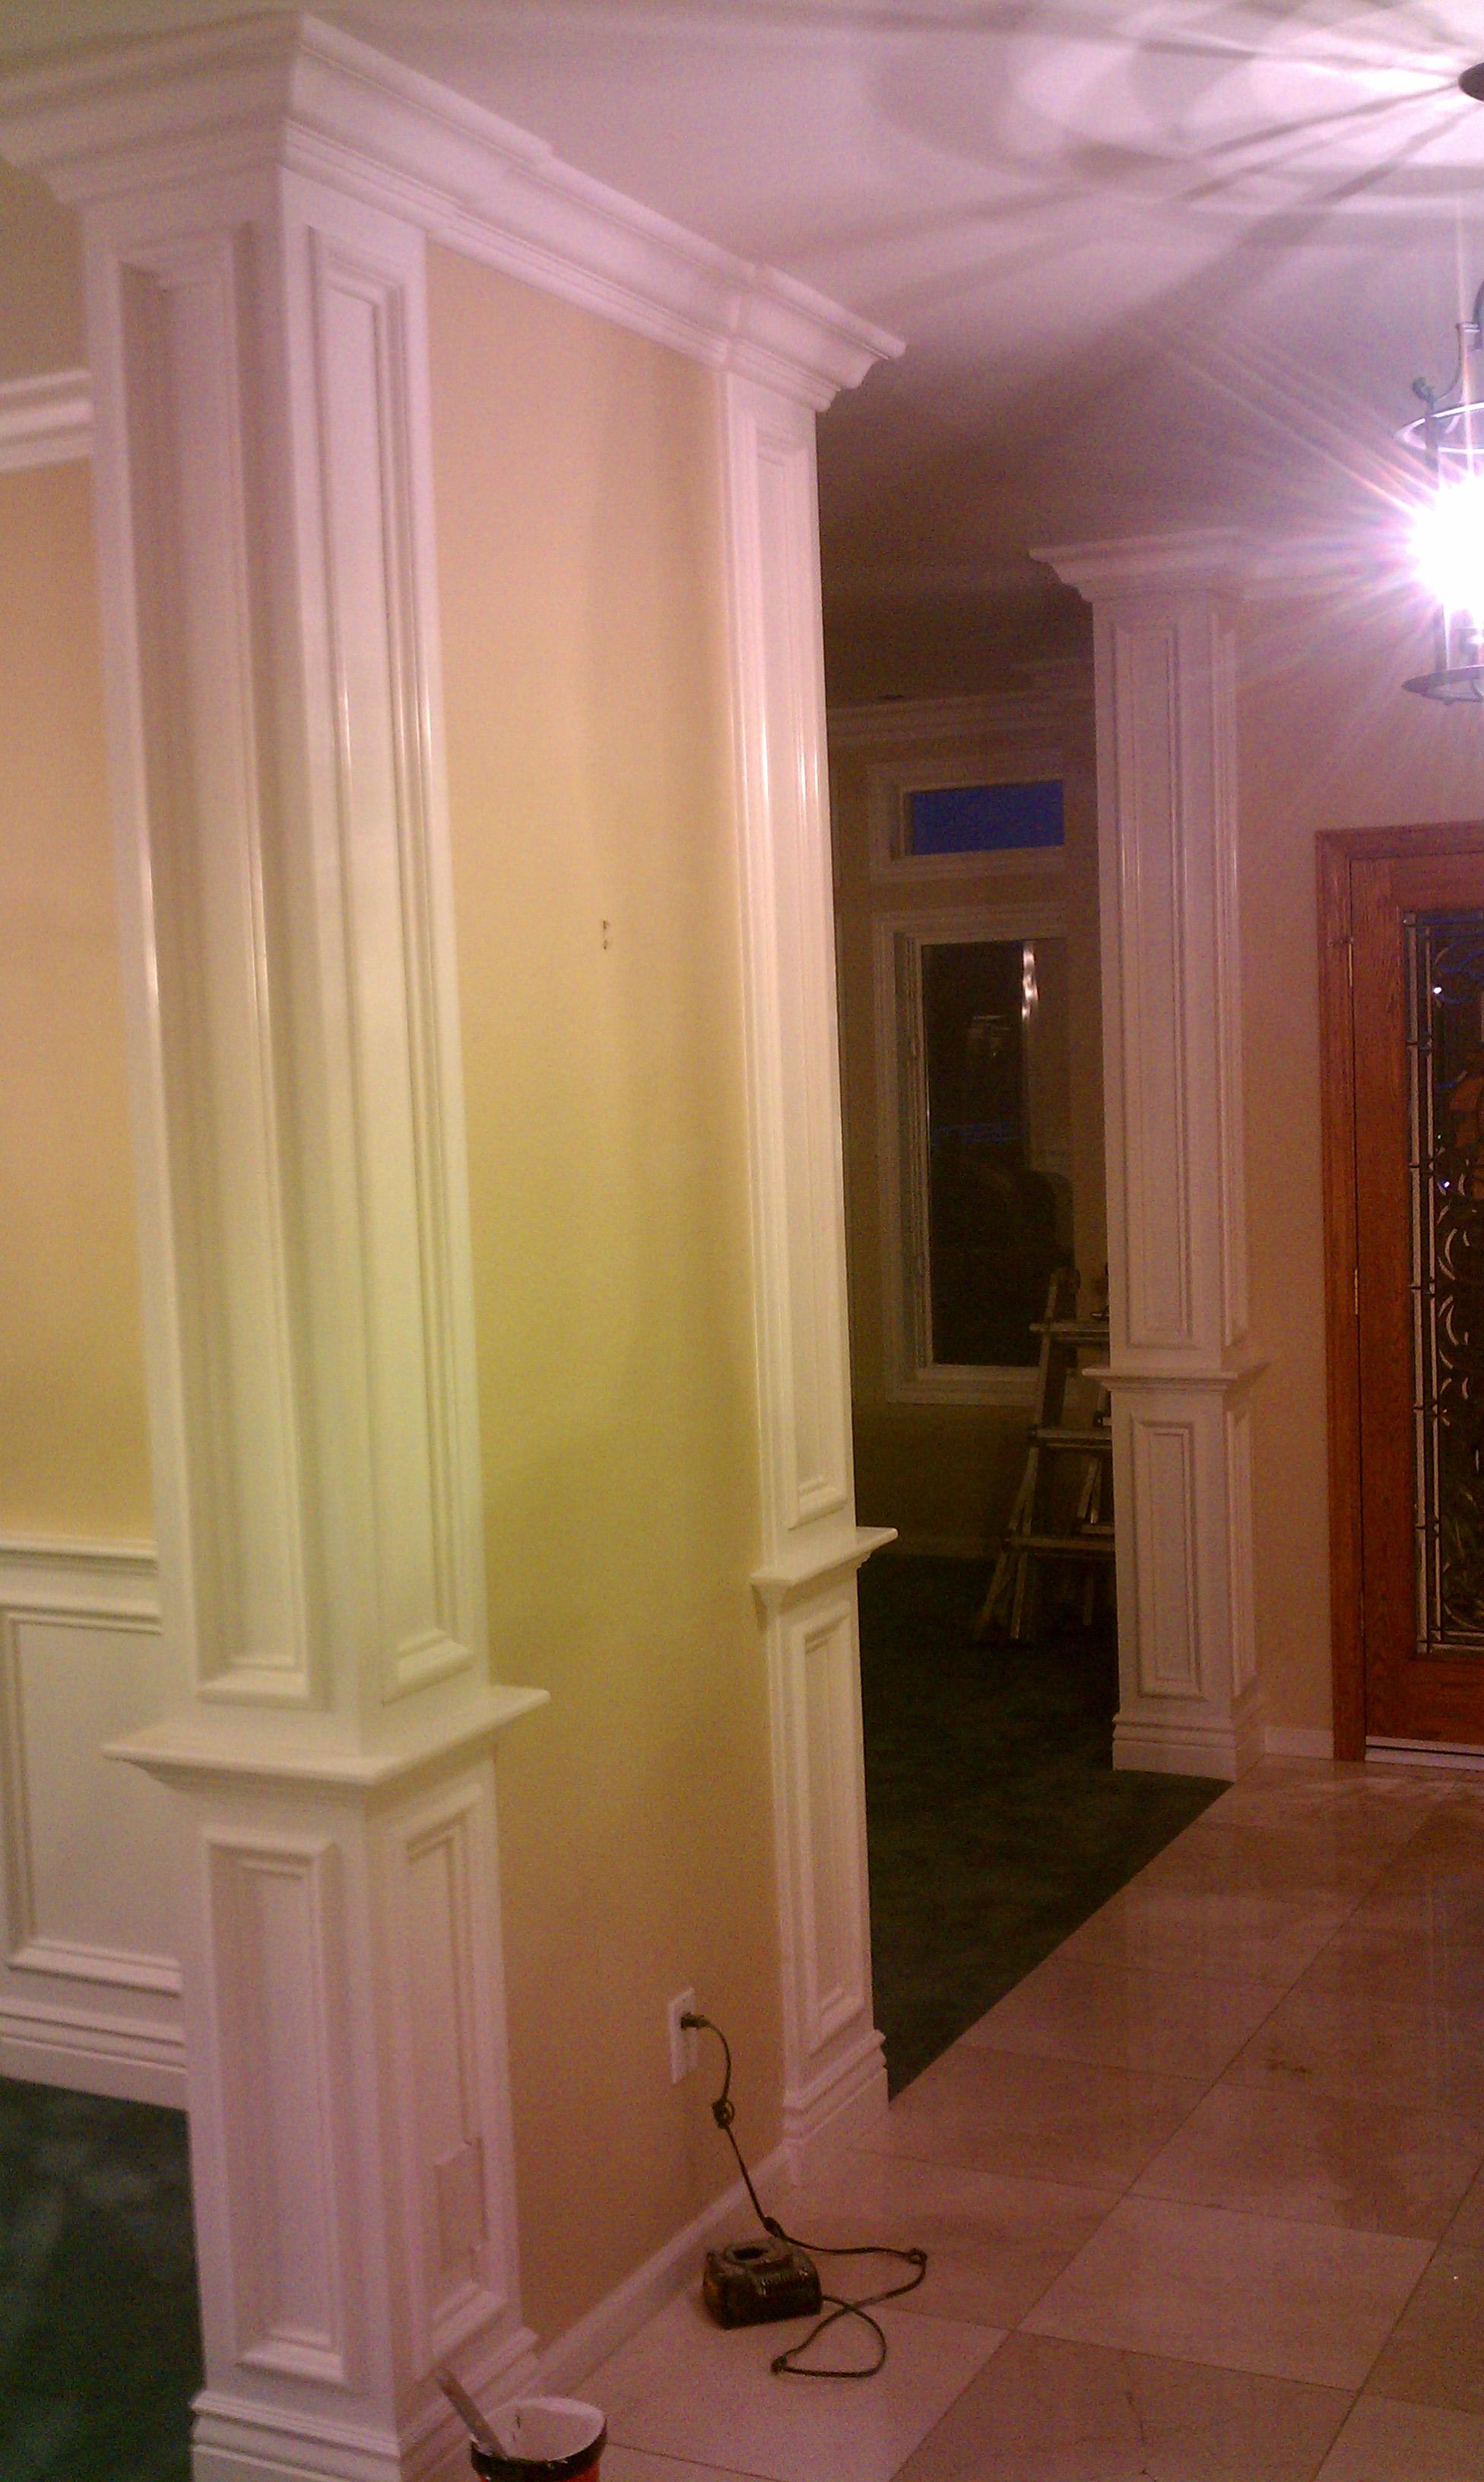 Dining Room Transformation in the Santiago Estates